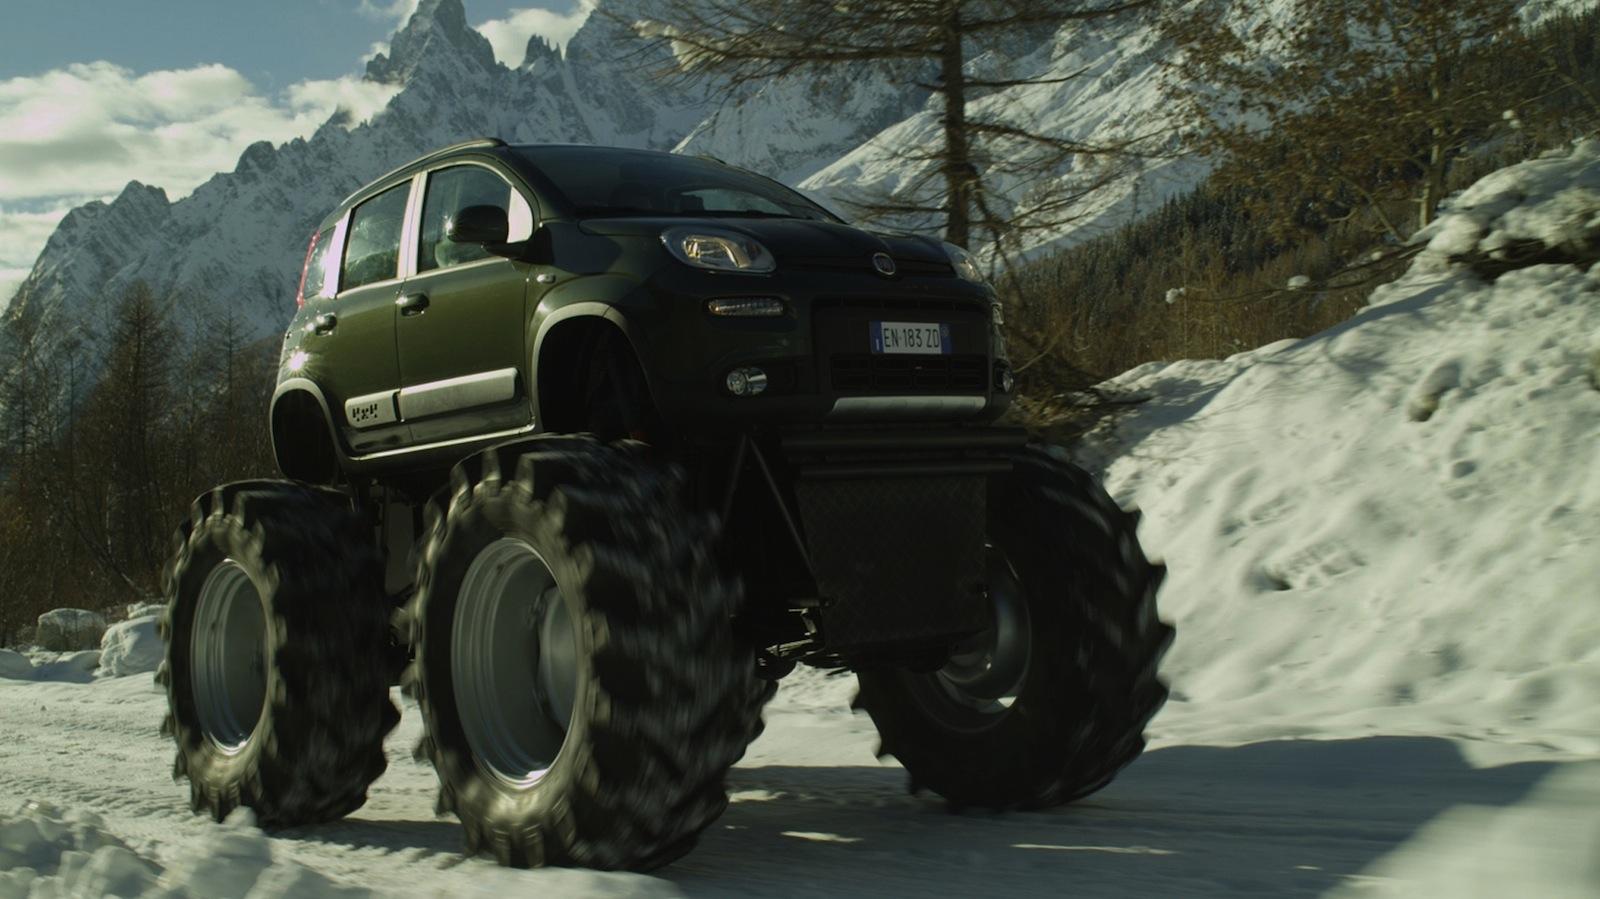 fiat panda 4x4 turns monster truck photos caradvice. Black Bedroom Furniture Sets. Home Design Ideas